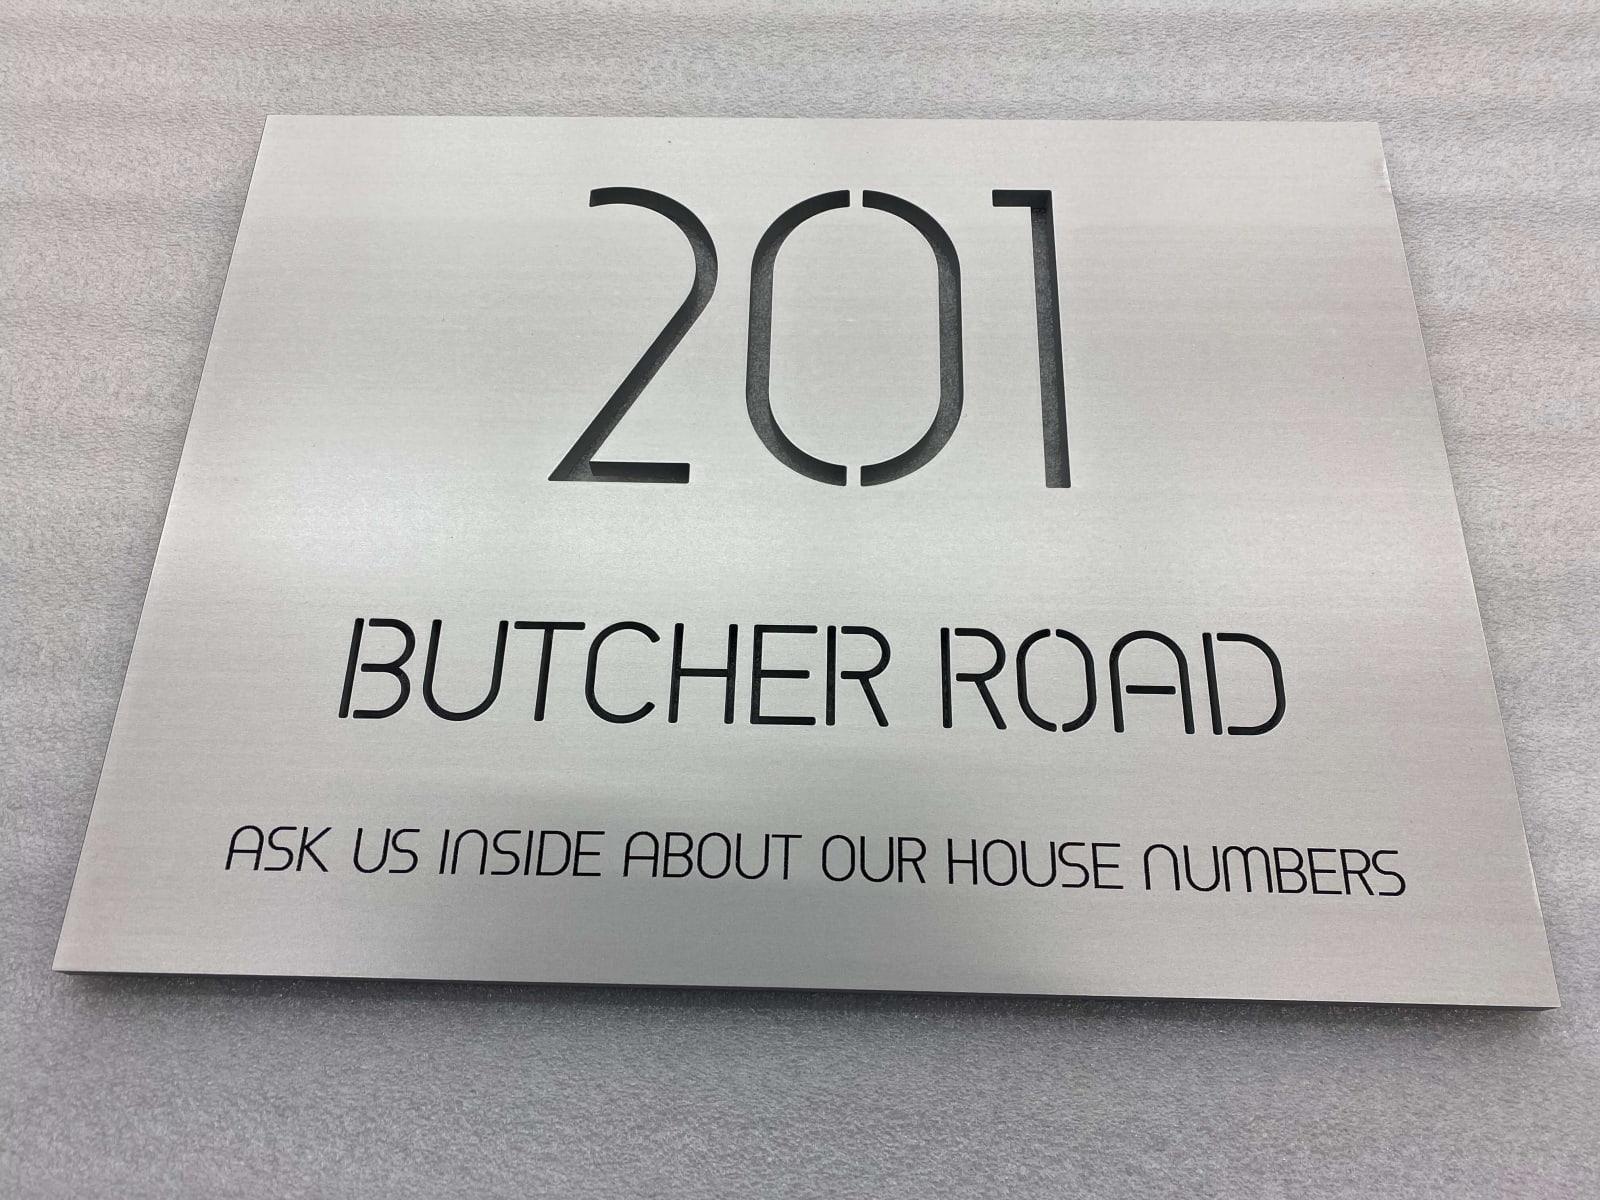 Vivid House Number | Custom Residential Address Signs | 201 Butcher Road | Aluminum Finish